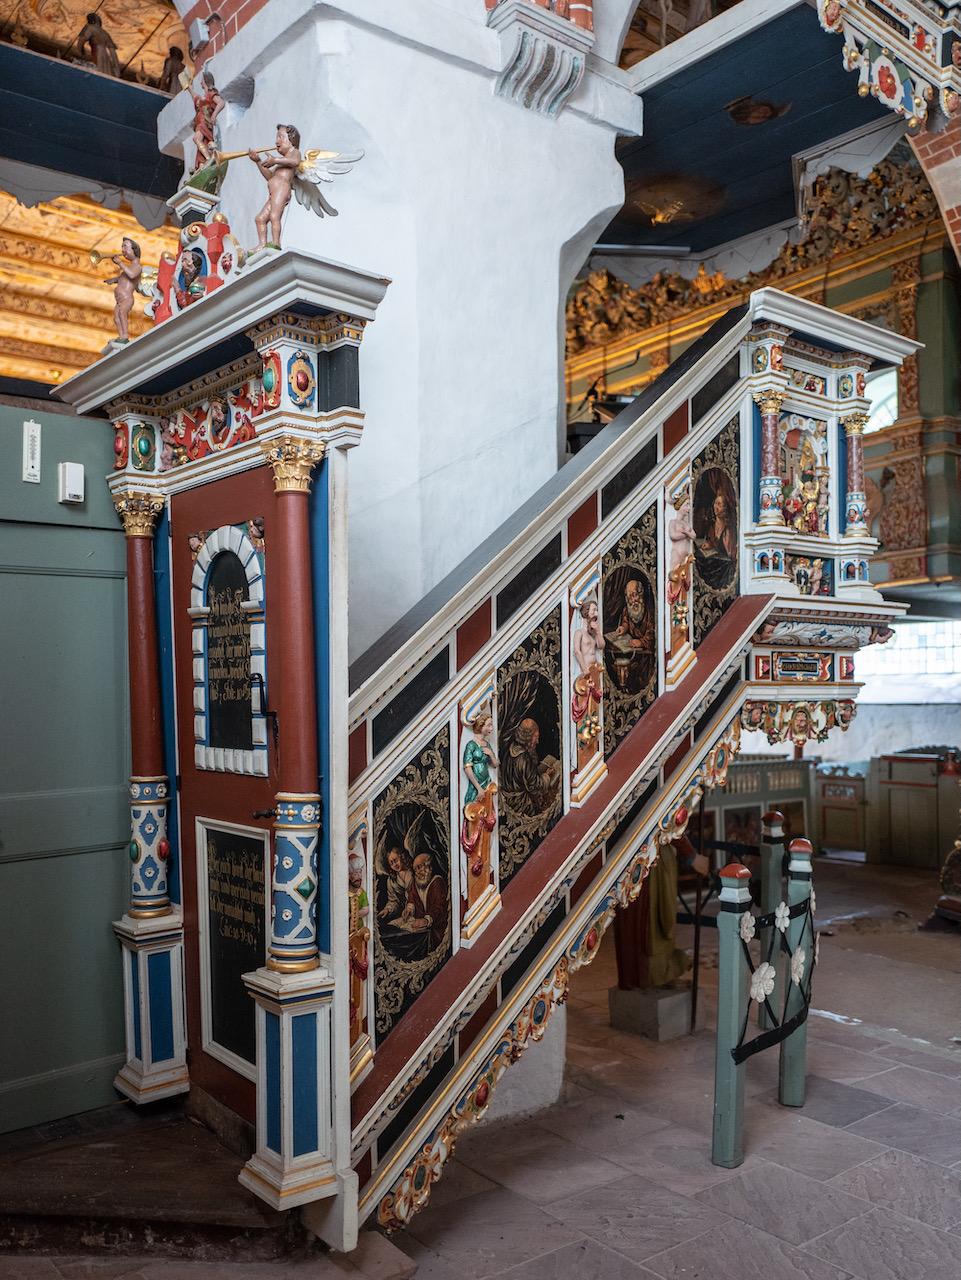 Kanzel, Treppe